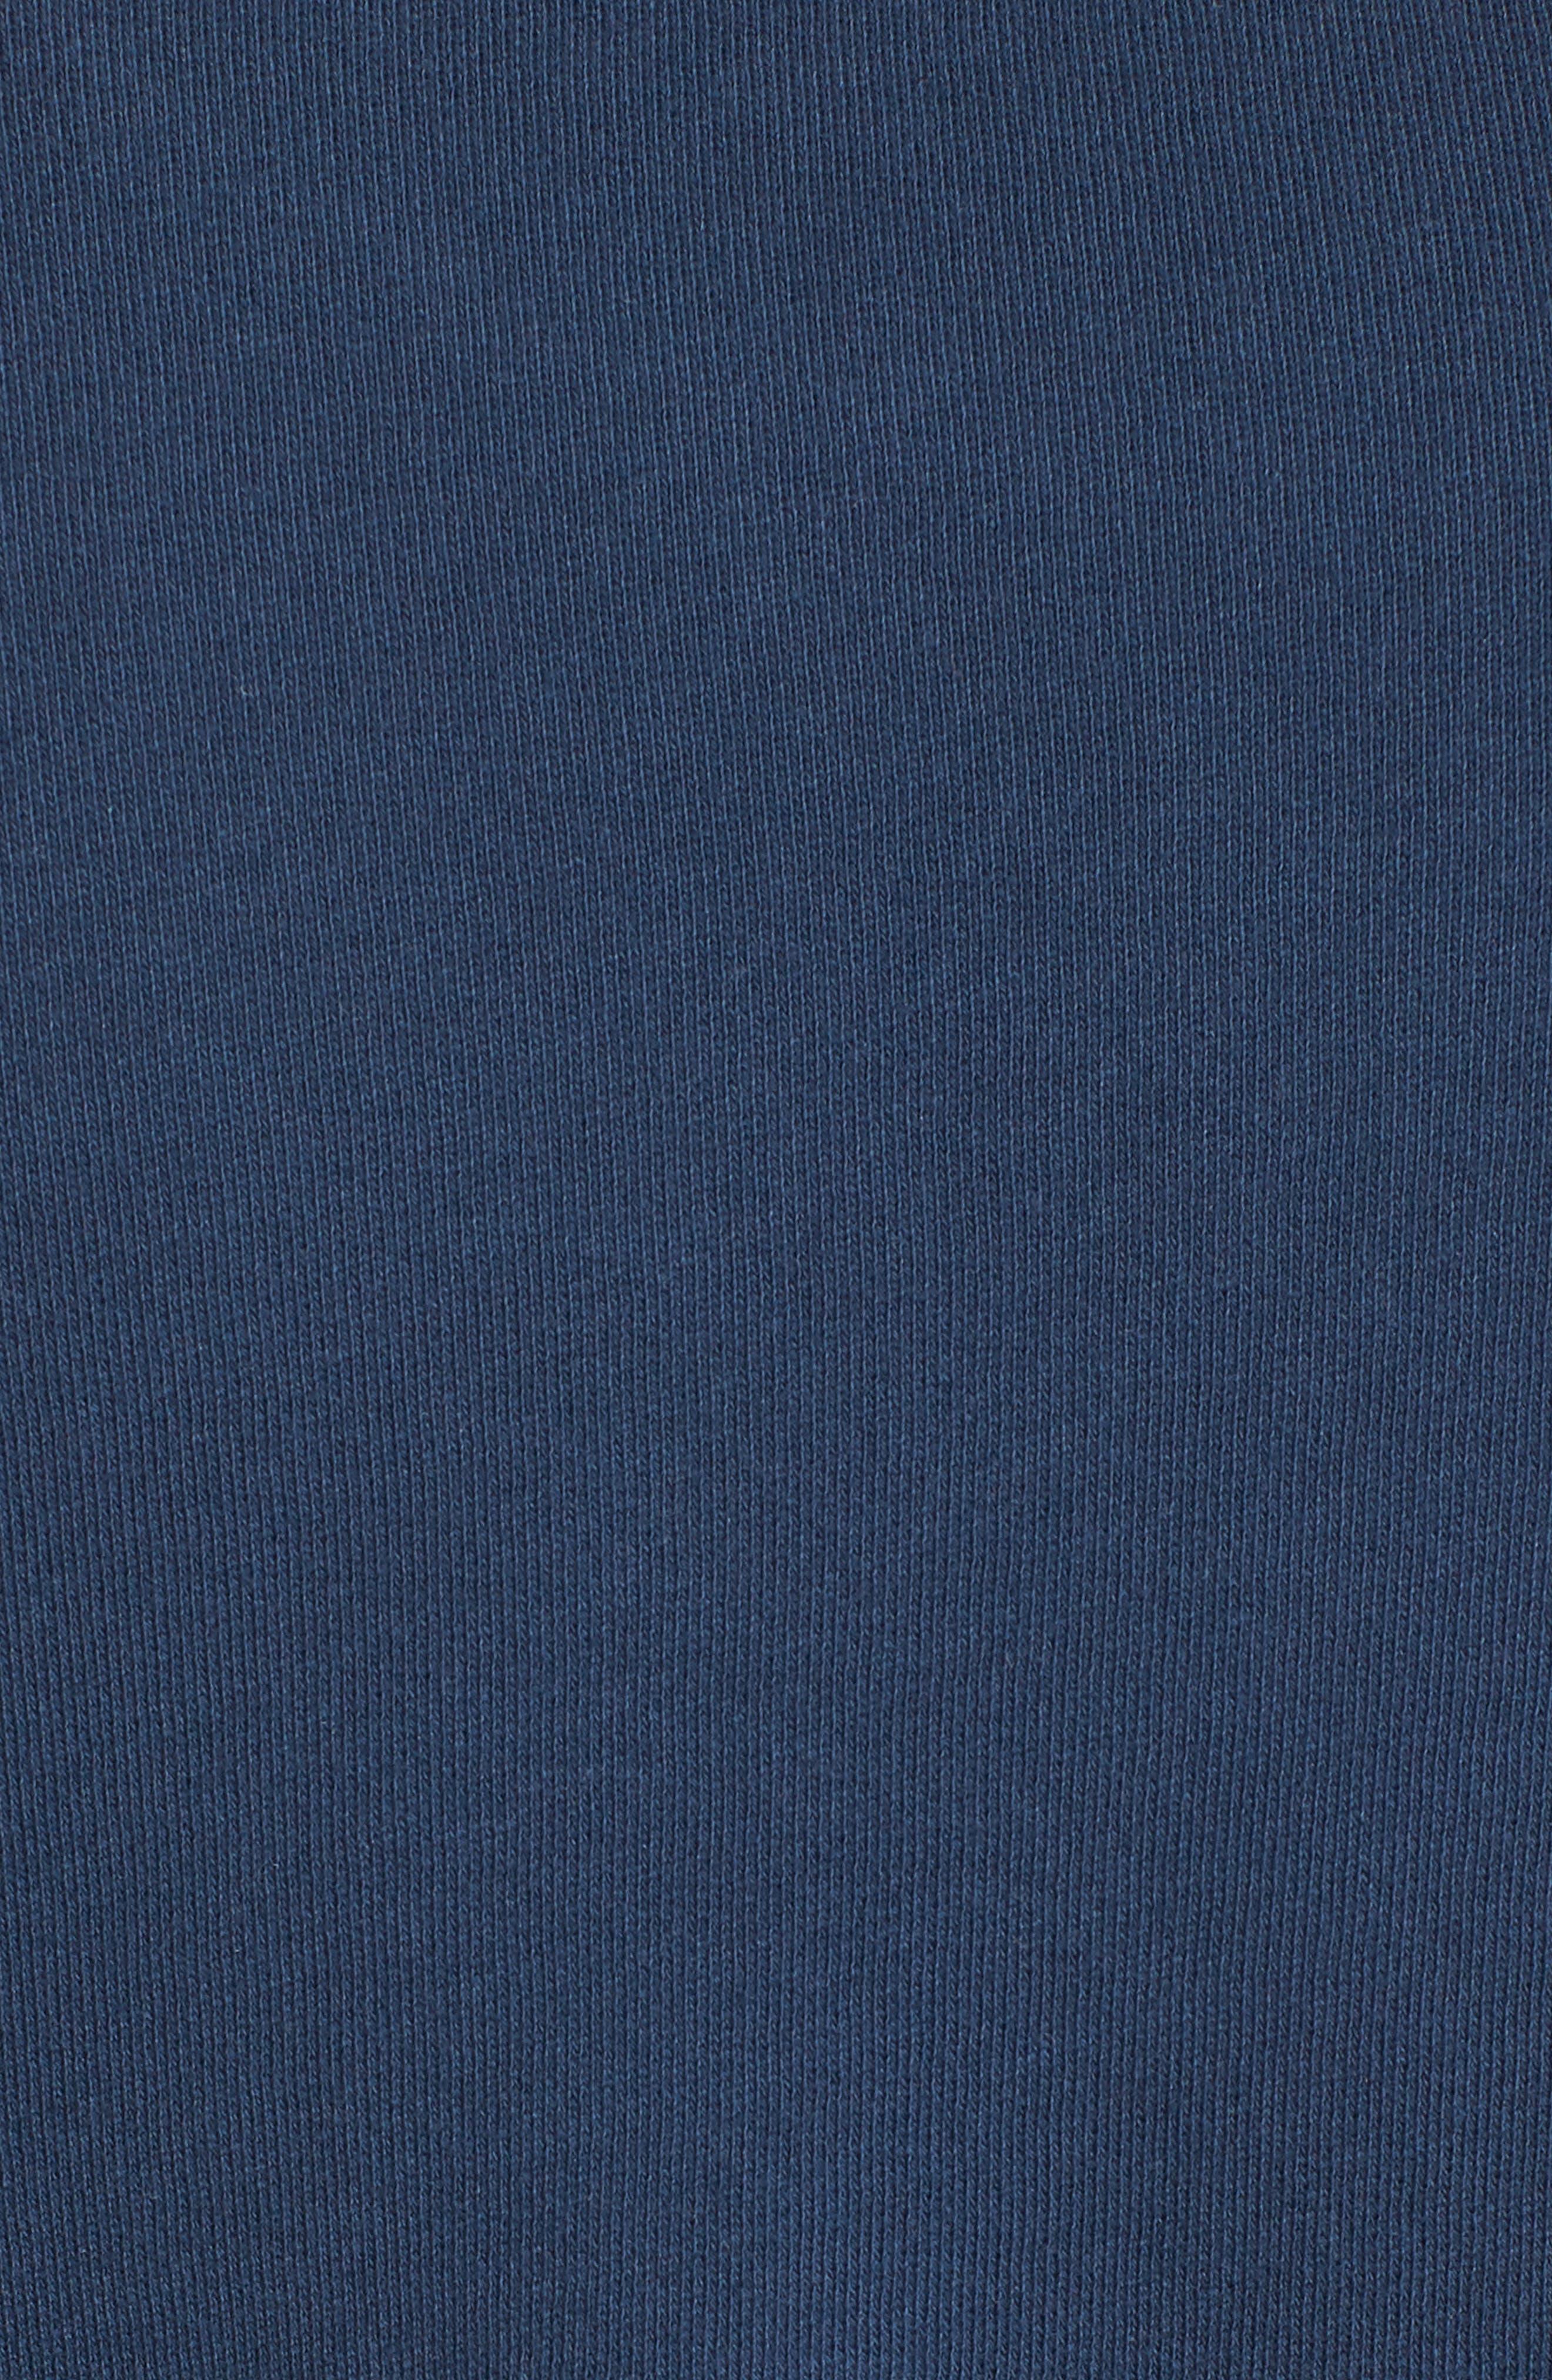 Alexa - Fashion Mafia Sweatshirt,                             Alternate thumbnail 6, color,                             400